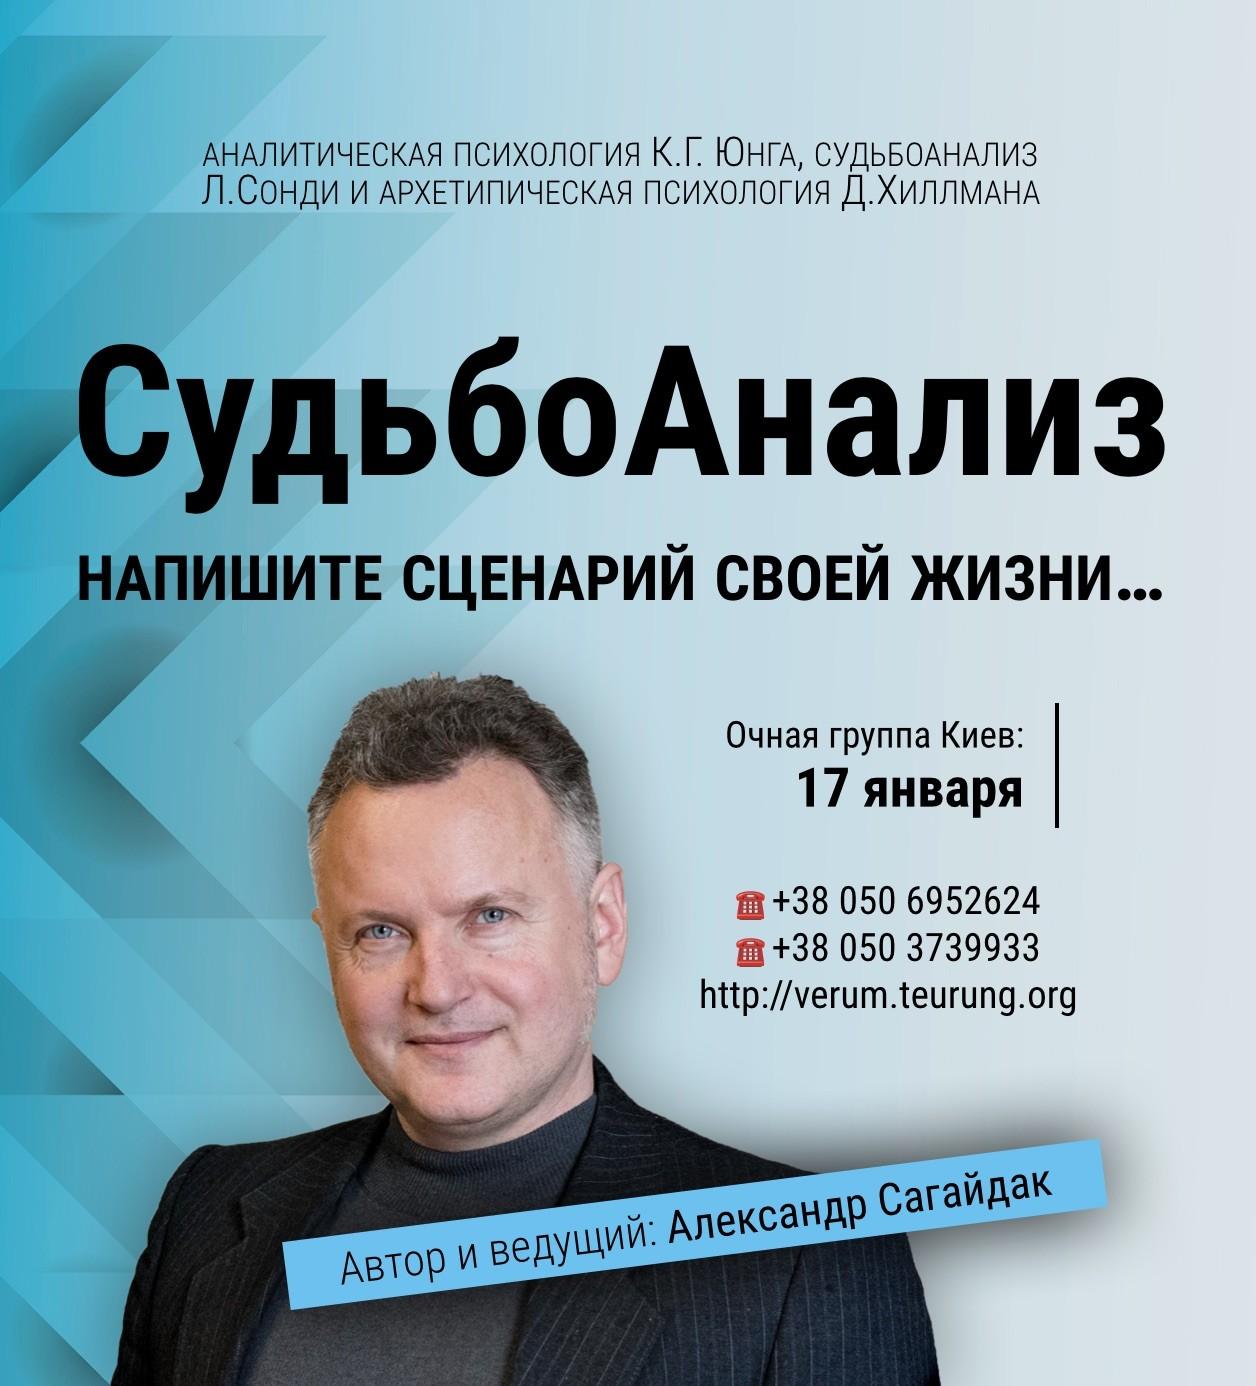 Набор Судьбоанализ Киев